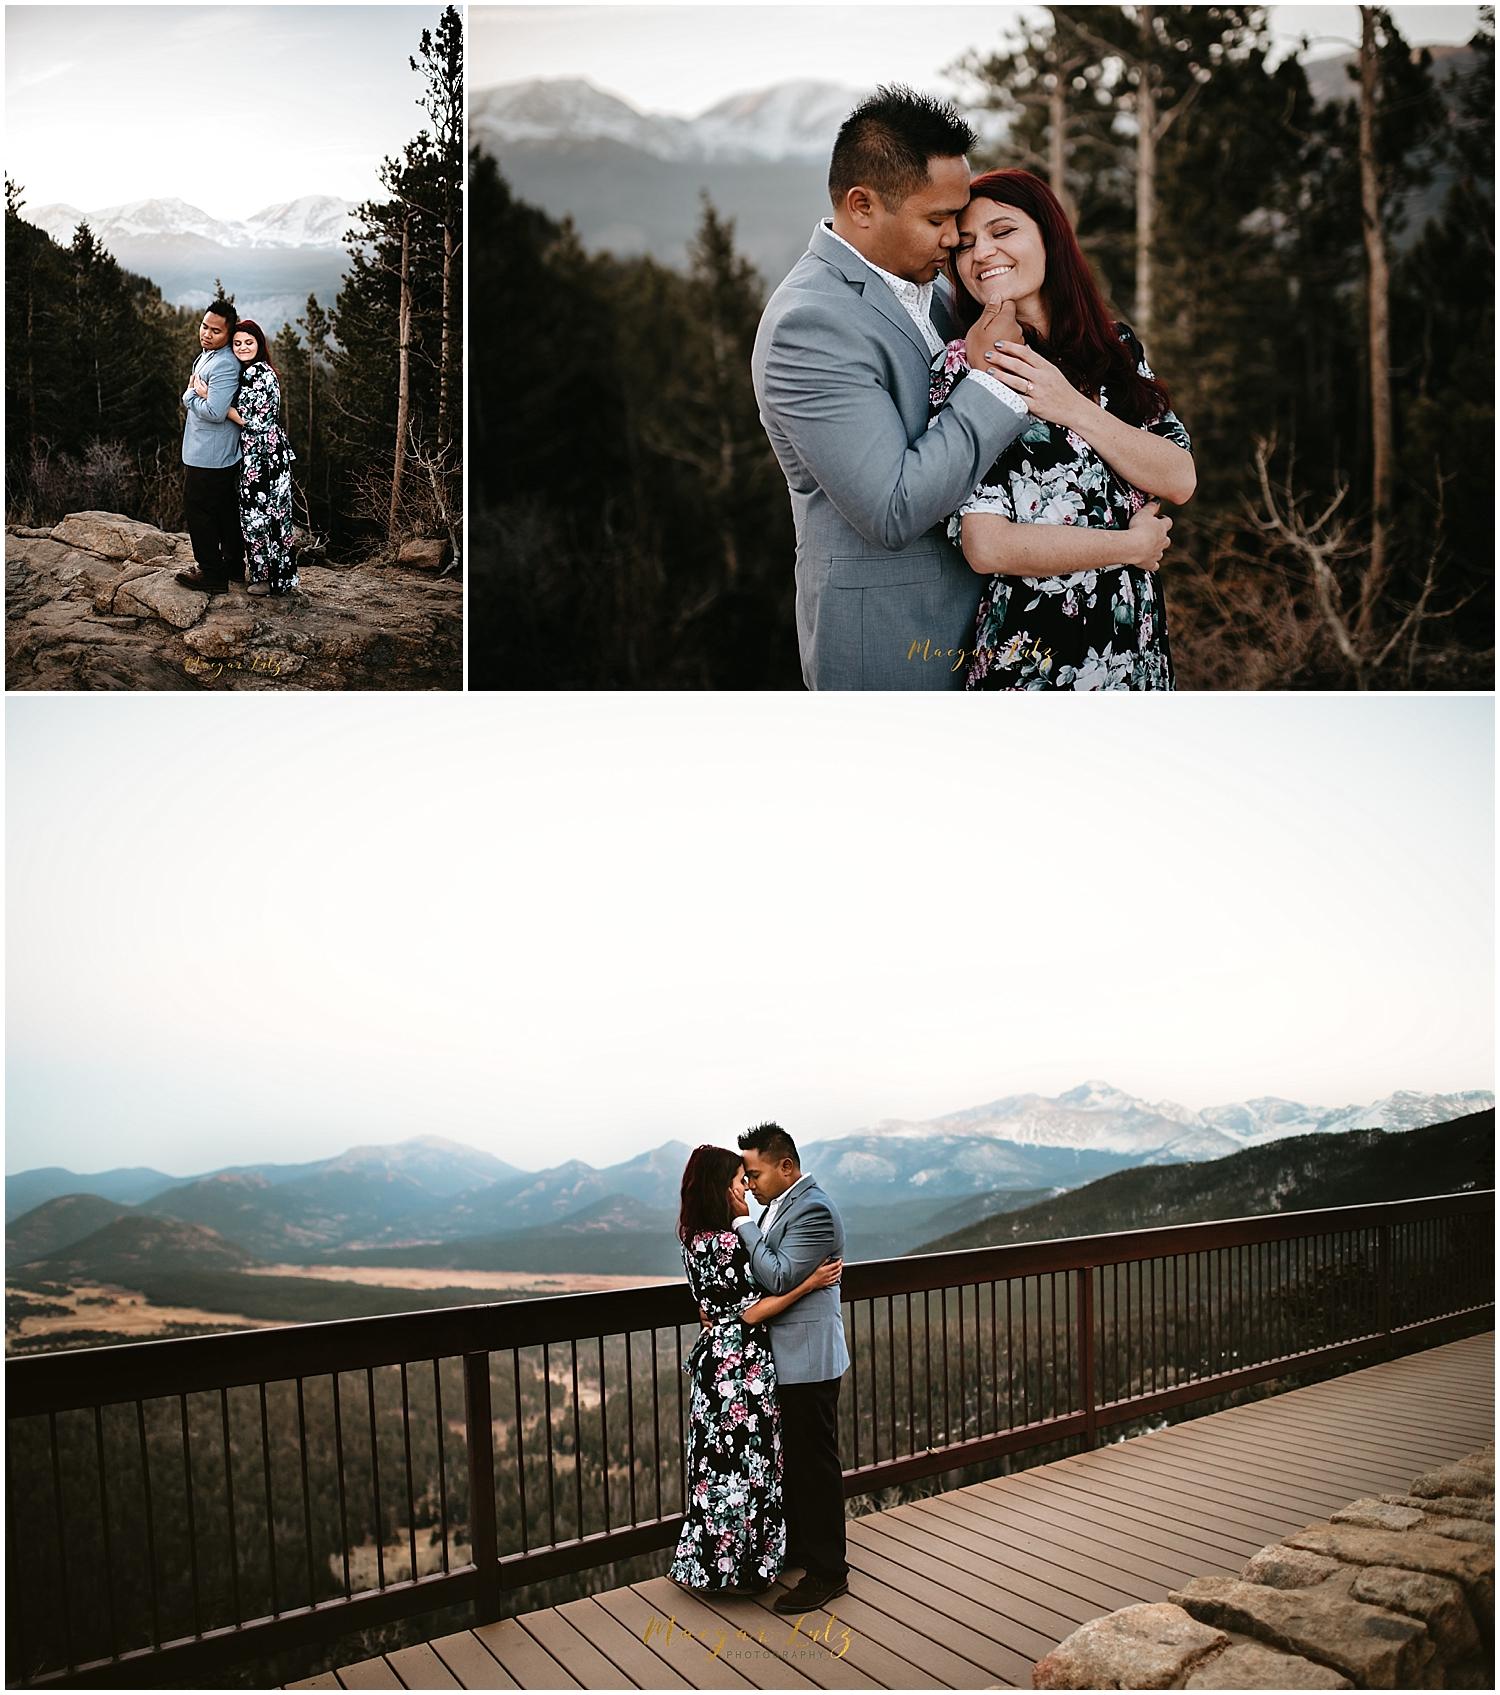 Destination-engagement-wedding-photographer-Colorado-Rocky-Mountain-National-Park-Session_0056.jpg